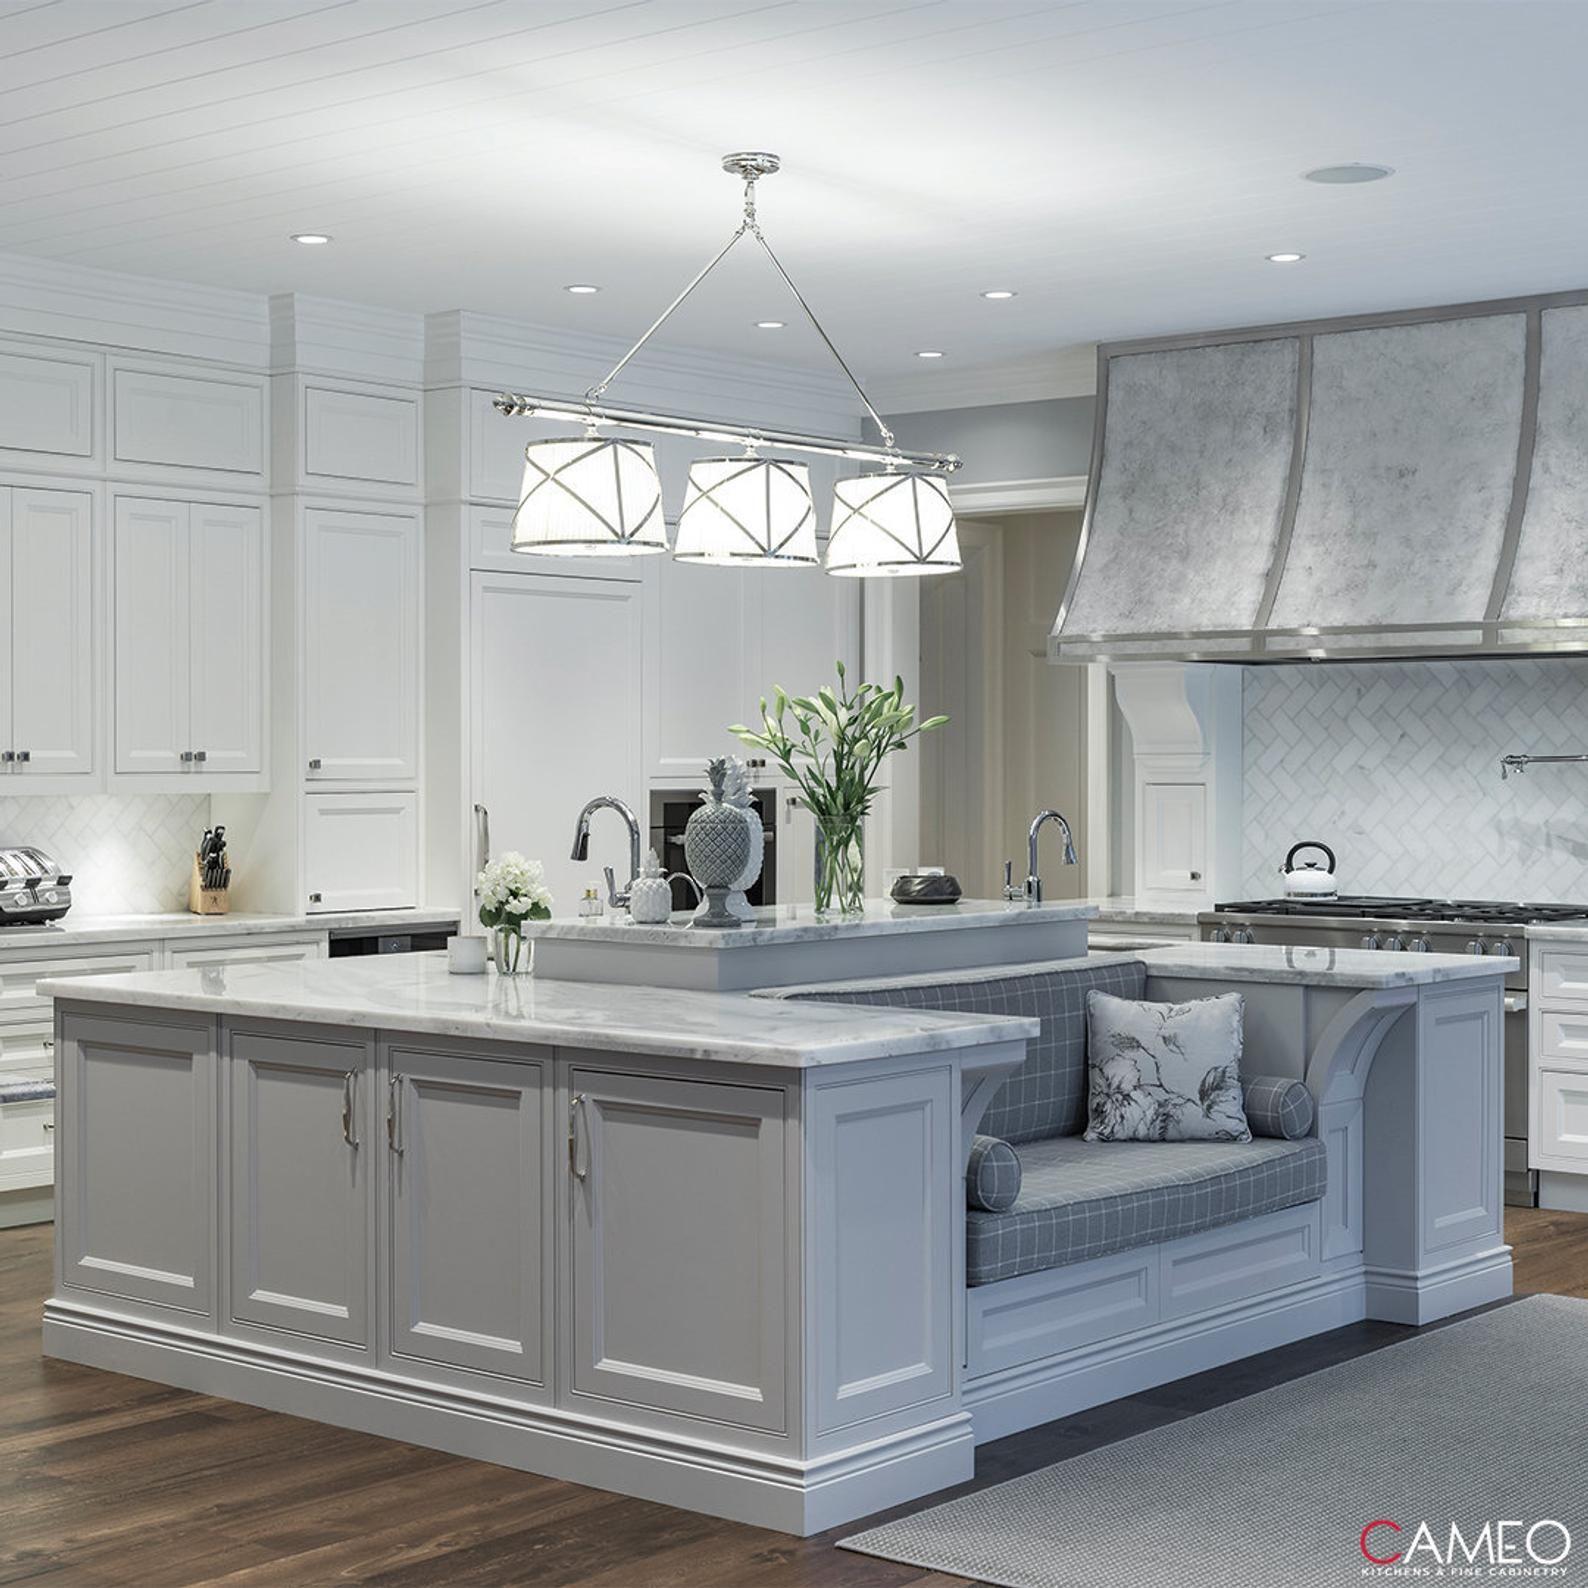 Island Post Isl Baw Series In 2021 Dream Kitchens Design Luxury Kitchen Design Modern Kitchen Design